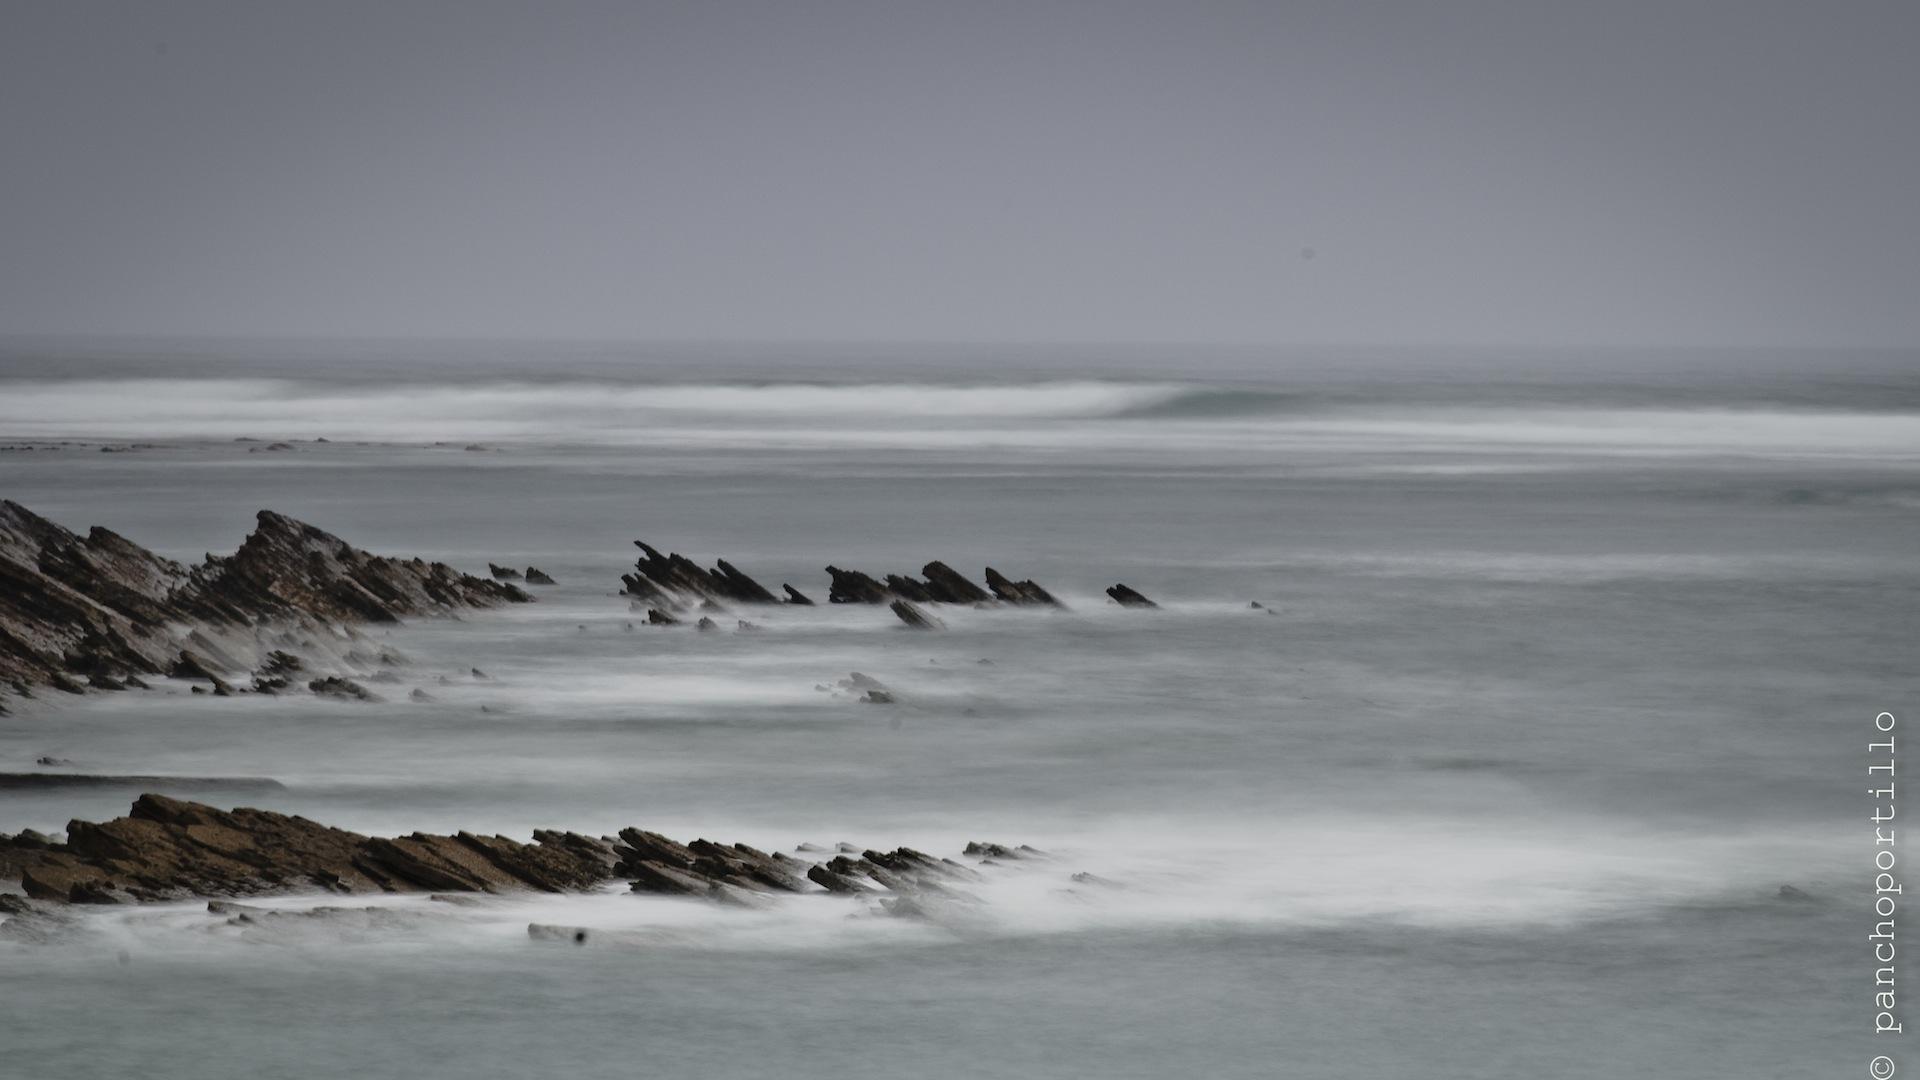 Biarritz-04-DSC2785-2